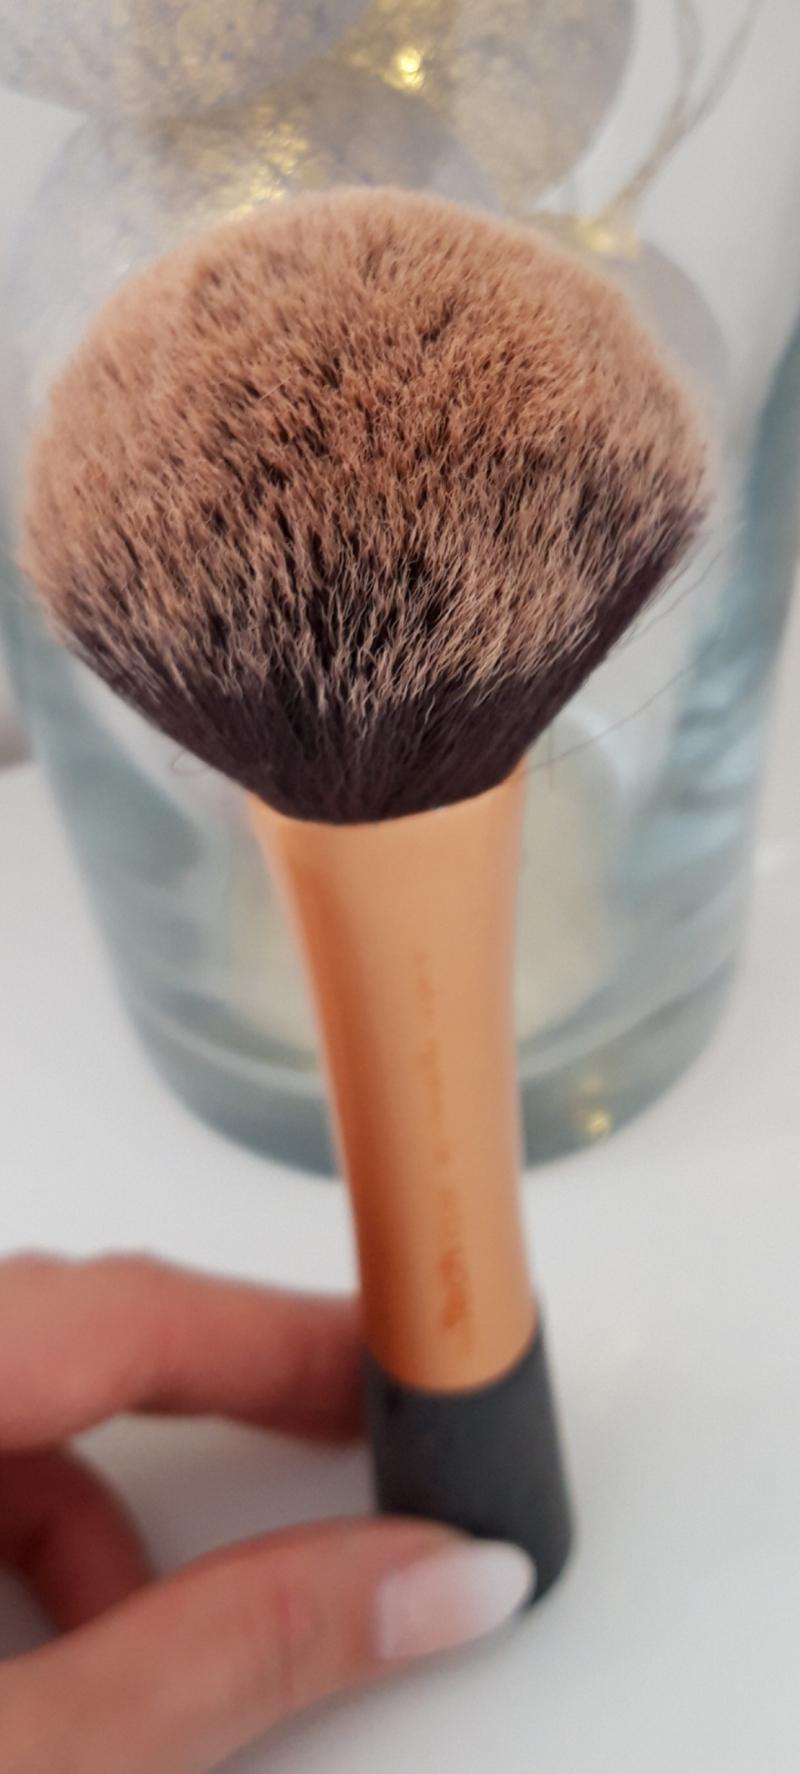 Swatch Powder Brush Pinceau Poudre, Real Techniques